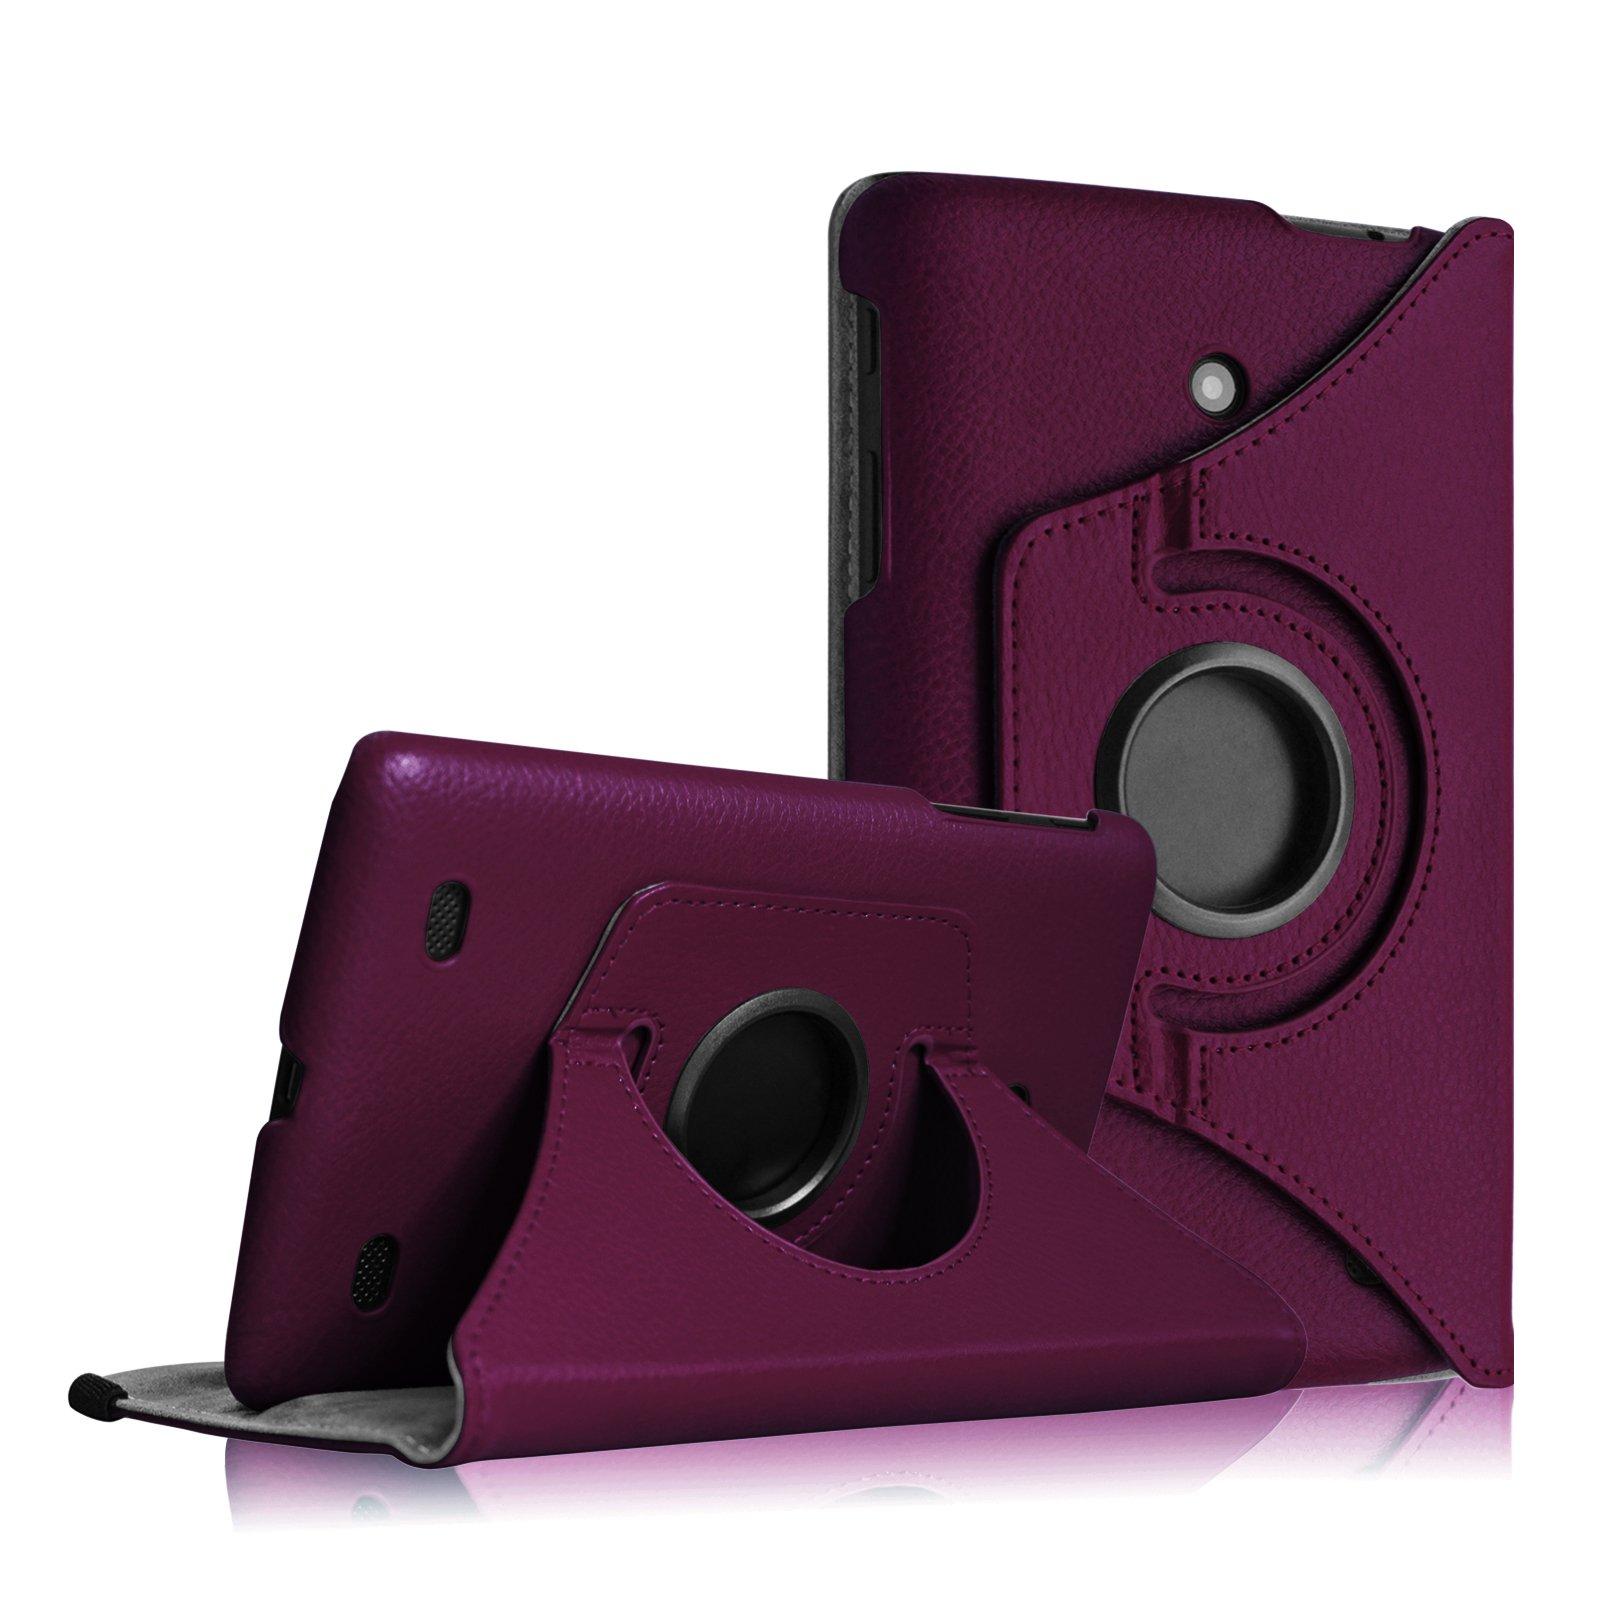 Fintie LG G Pad 7.0 Case - 360 Degree Rotating